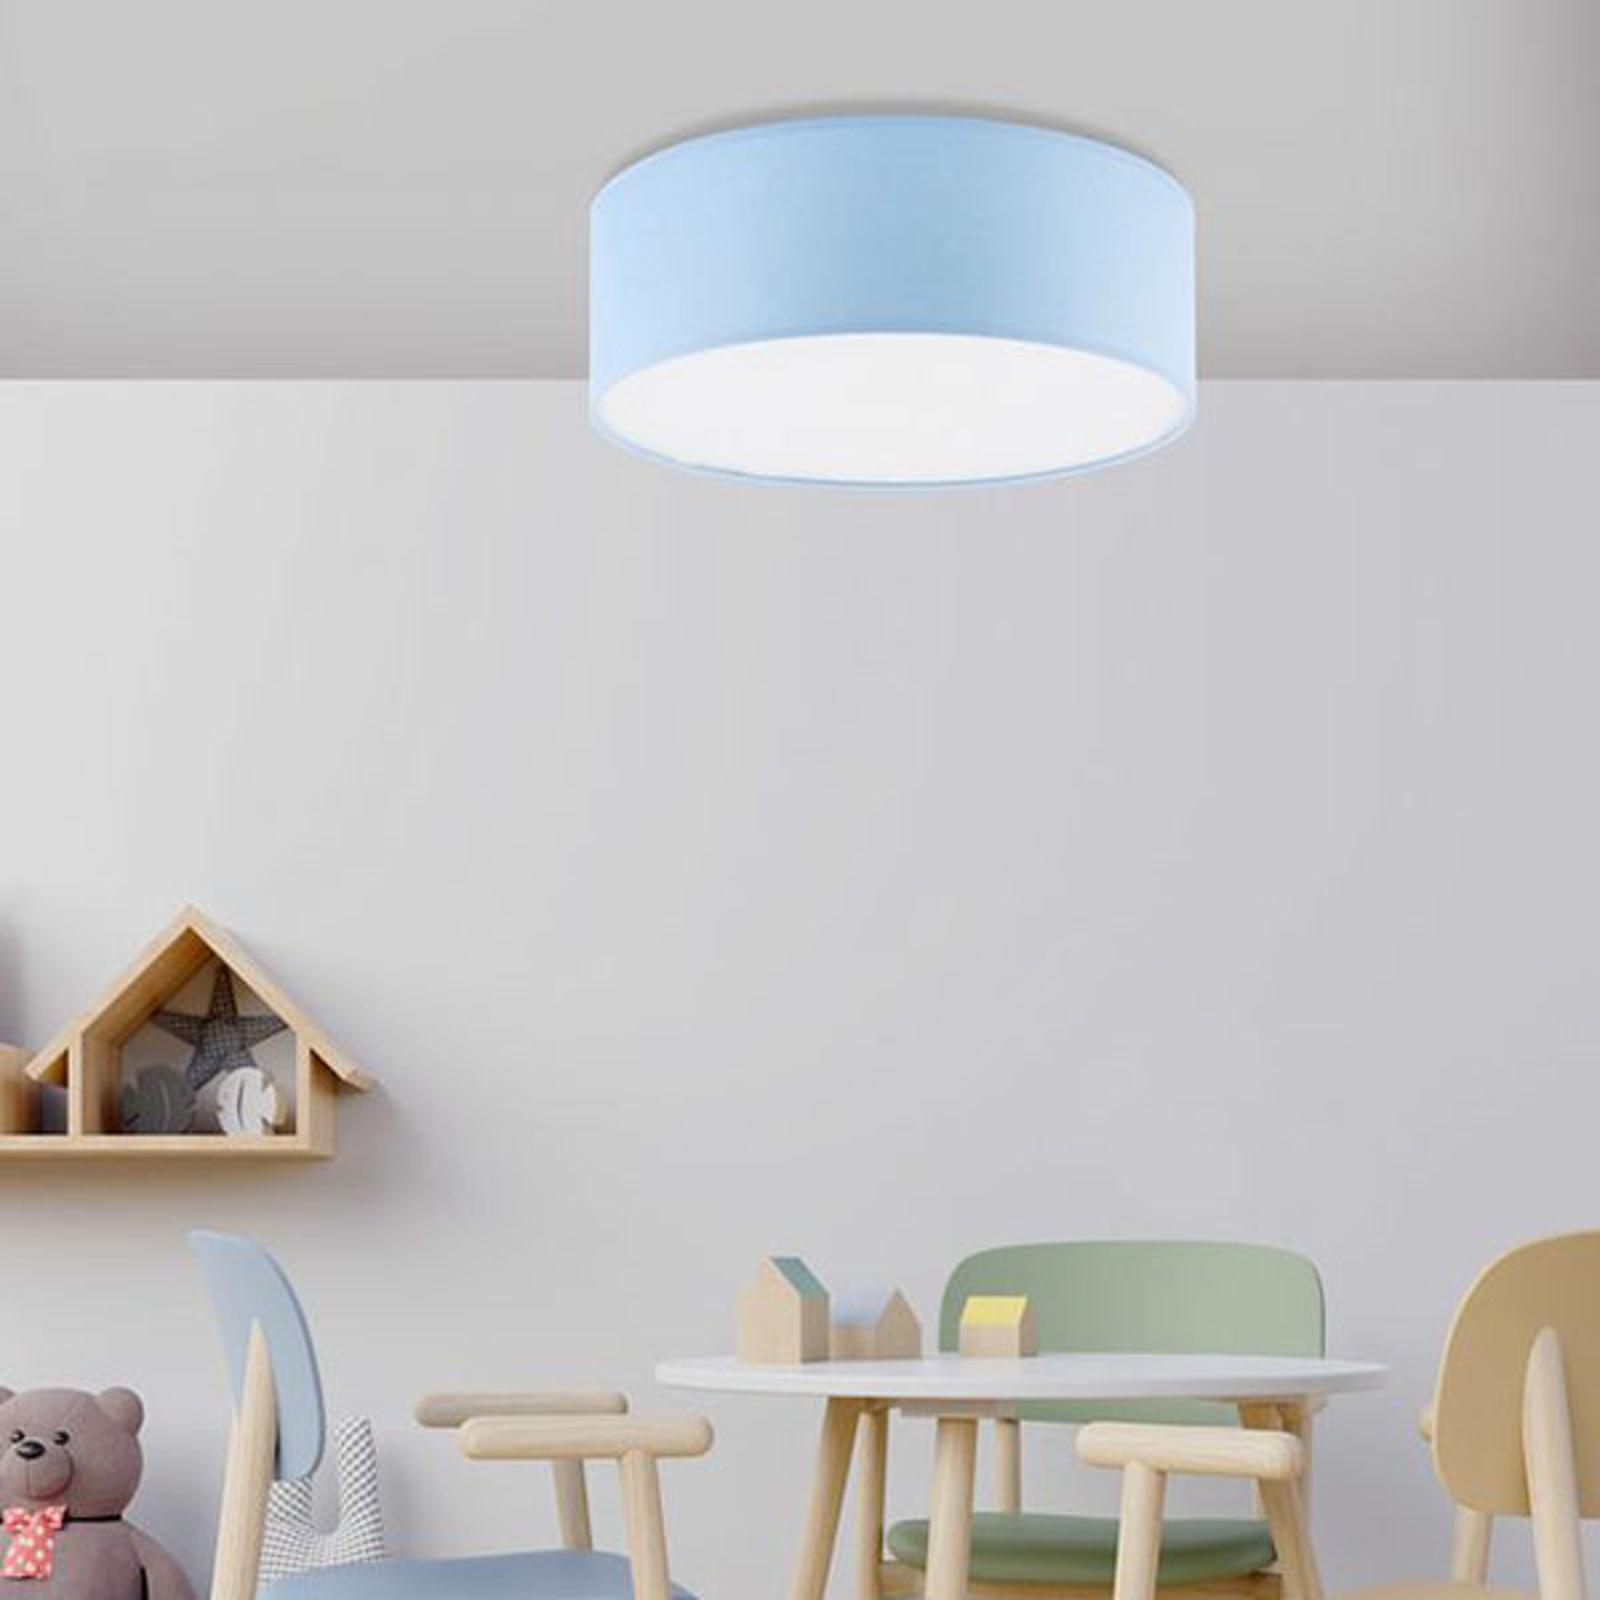 Lampa sufitowa Rondo Kids, Ø 38 cm, niebieska